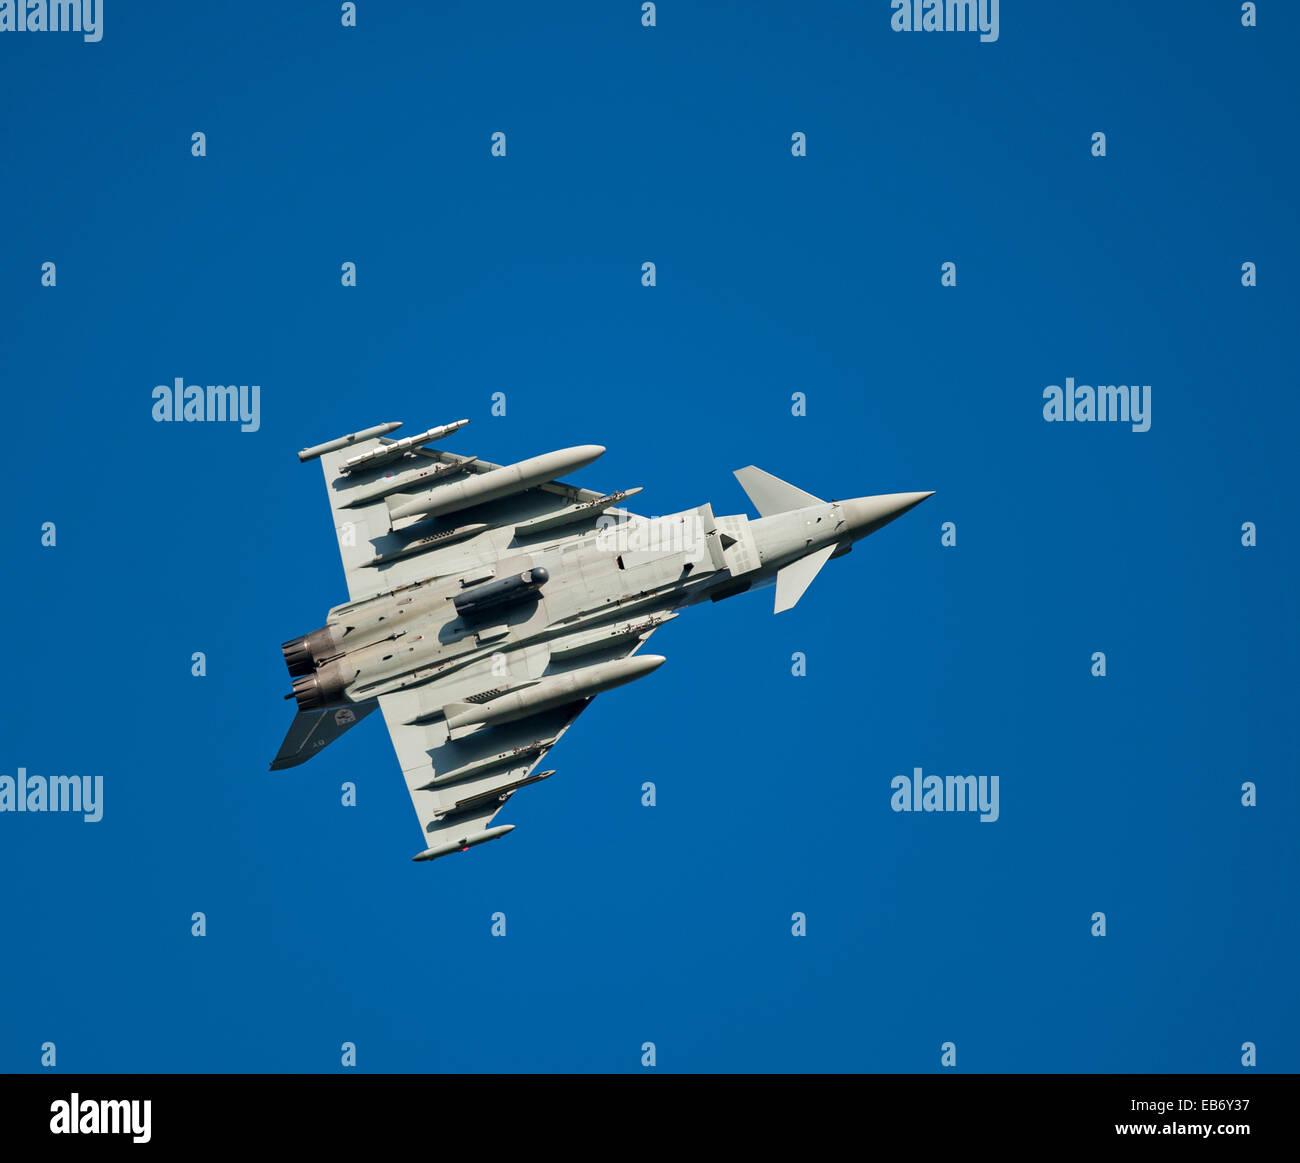 Eurofighter Typhoon FRG4 Military Fast Jet Fighter.  SCO 9196. Stock Photo